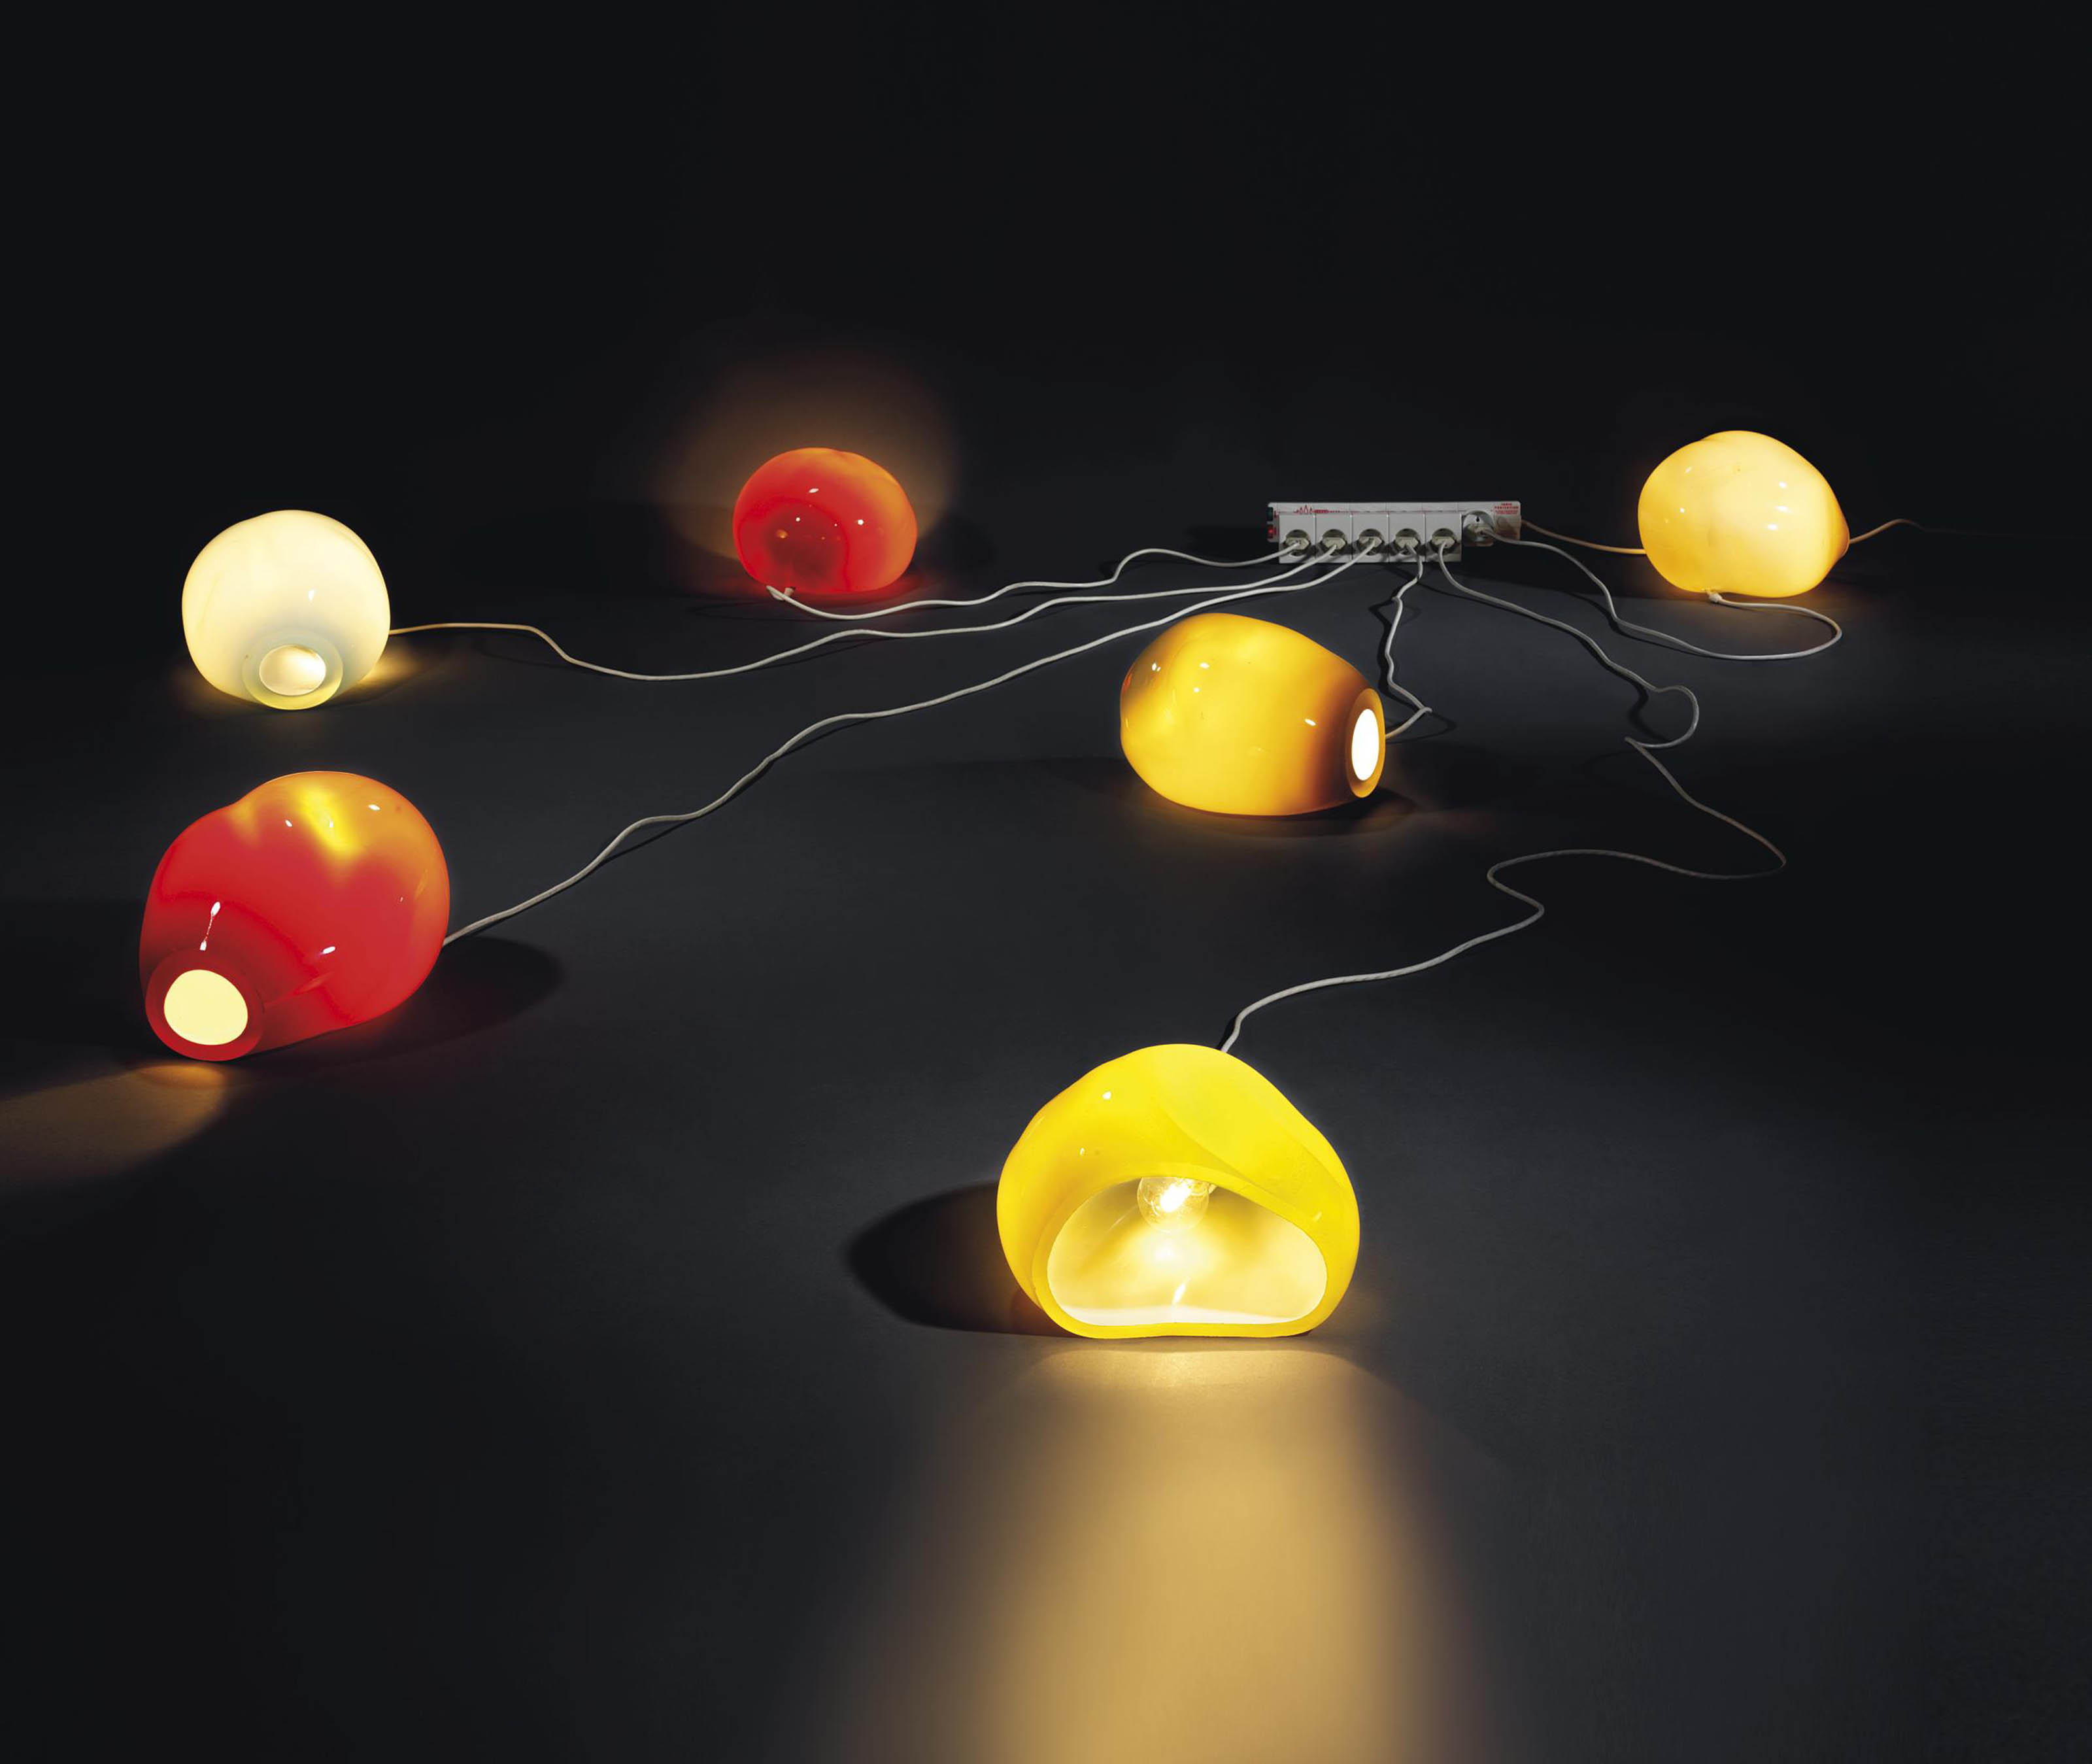 Untitled (Six Lamps)